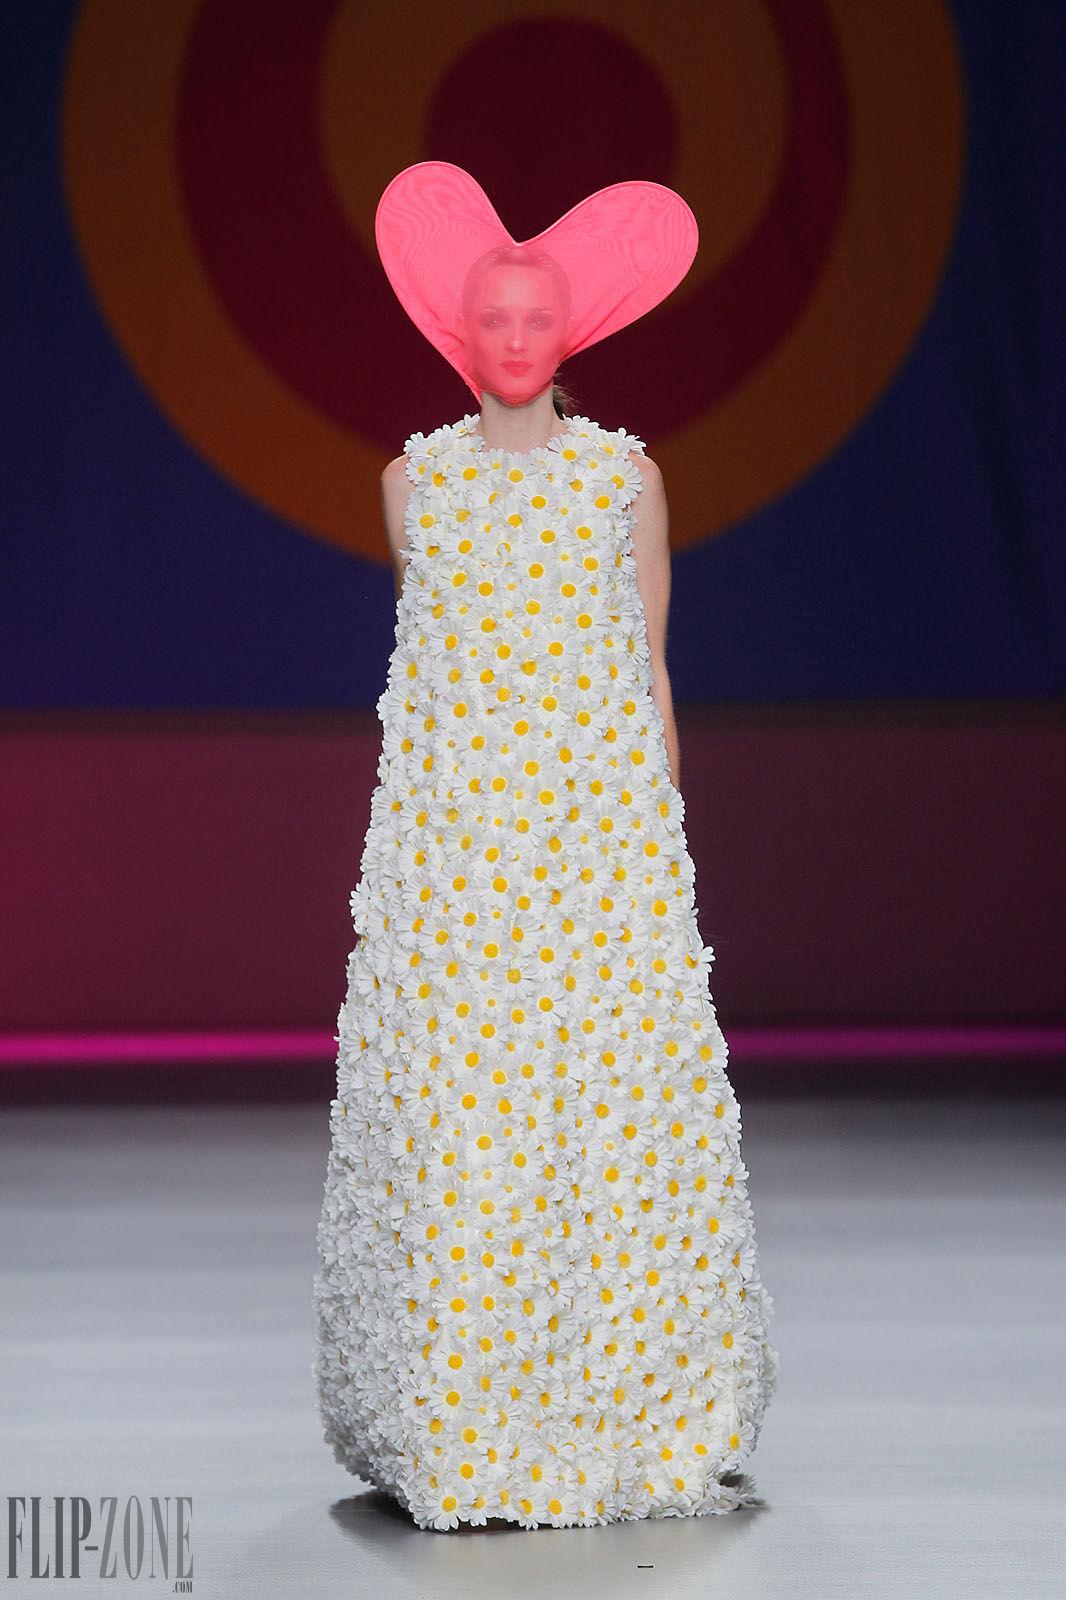 Honey Buy: Agatha Ruiz de la Prada wedding dresses